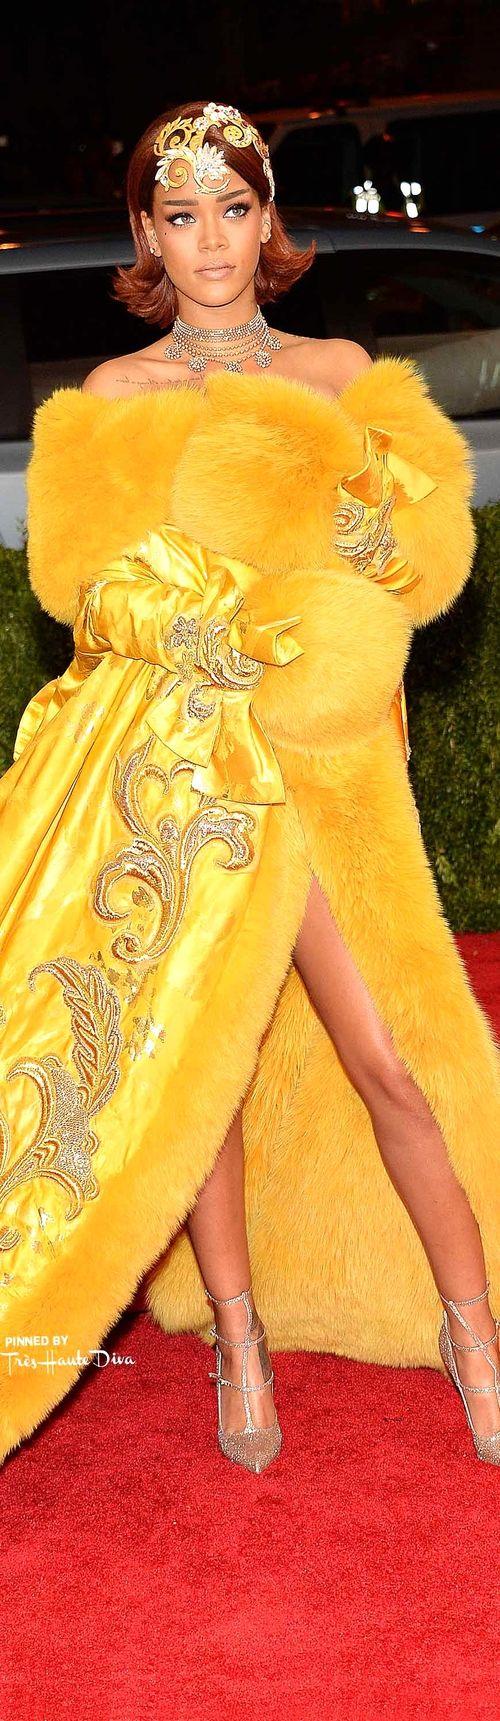 Рианна в Guo Pei Couture, Louboutin обувь Getty Images / Kevin Mazur